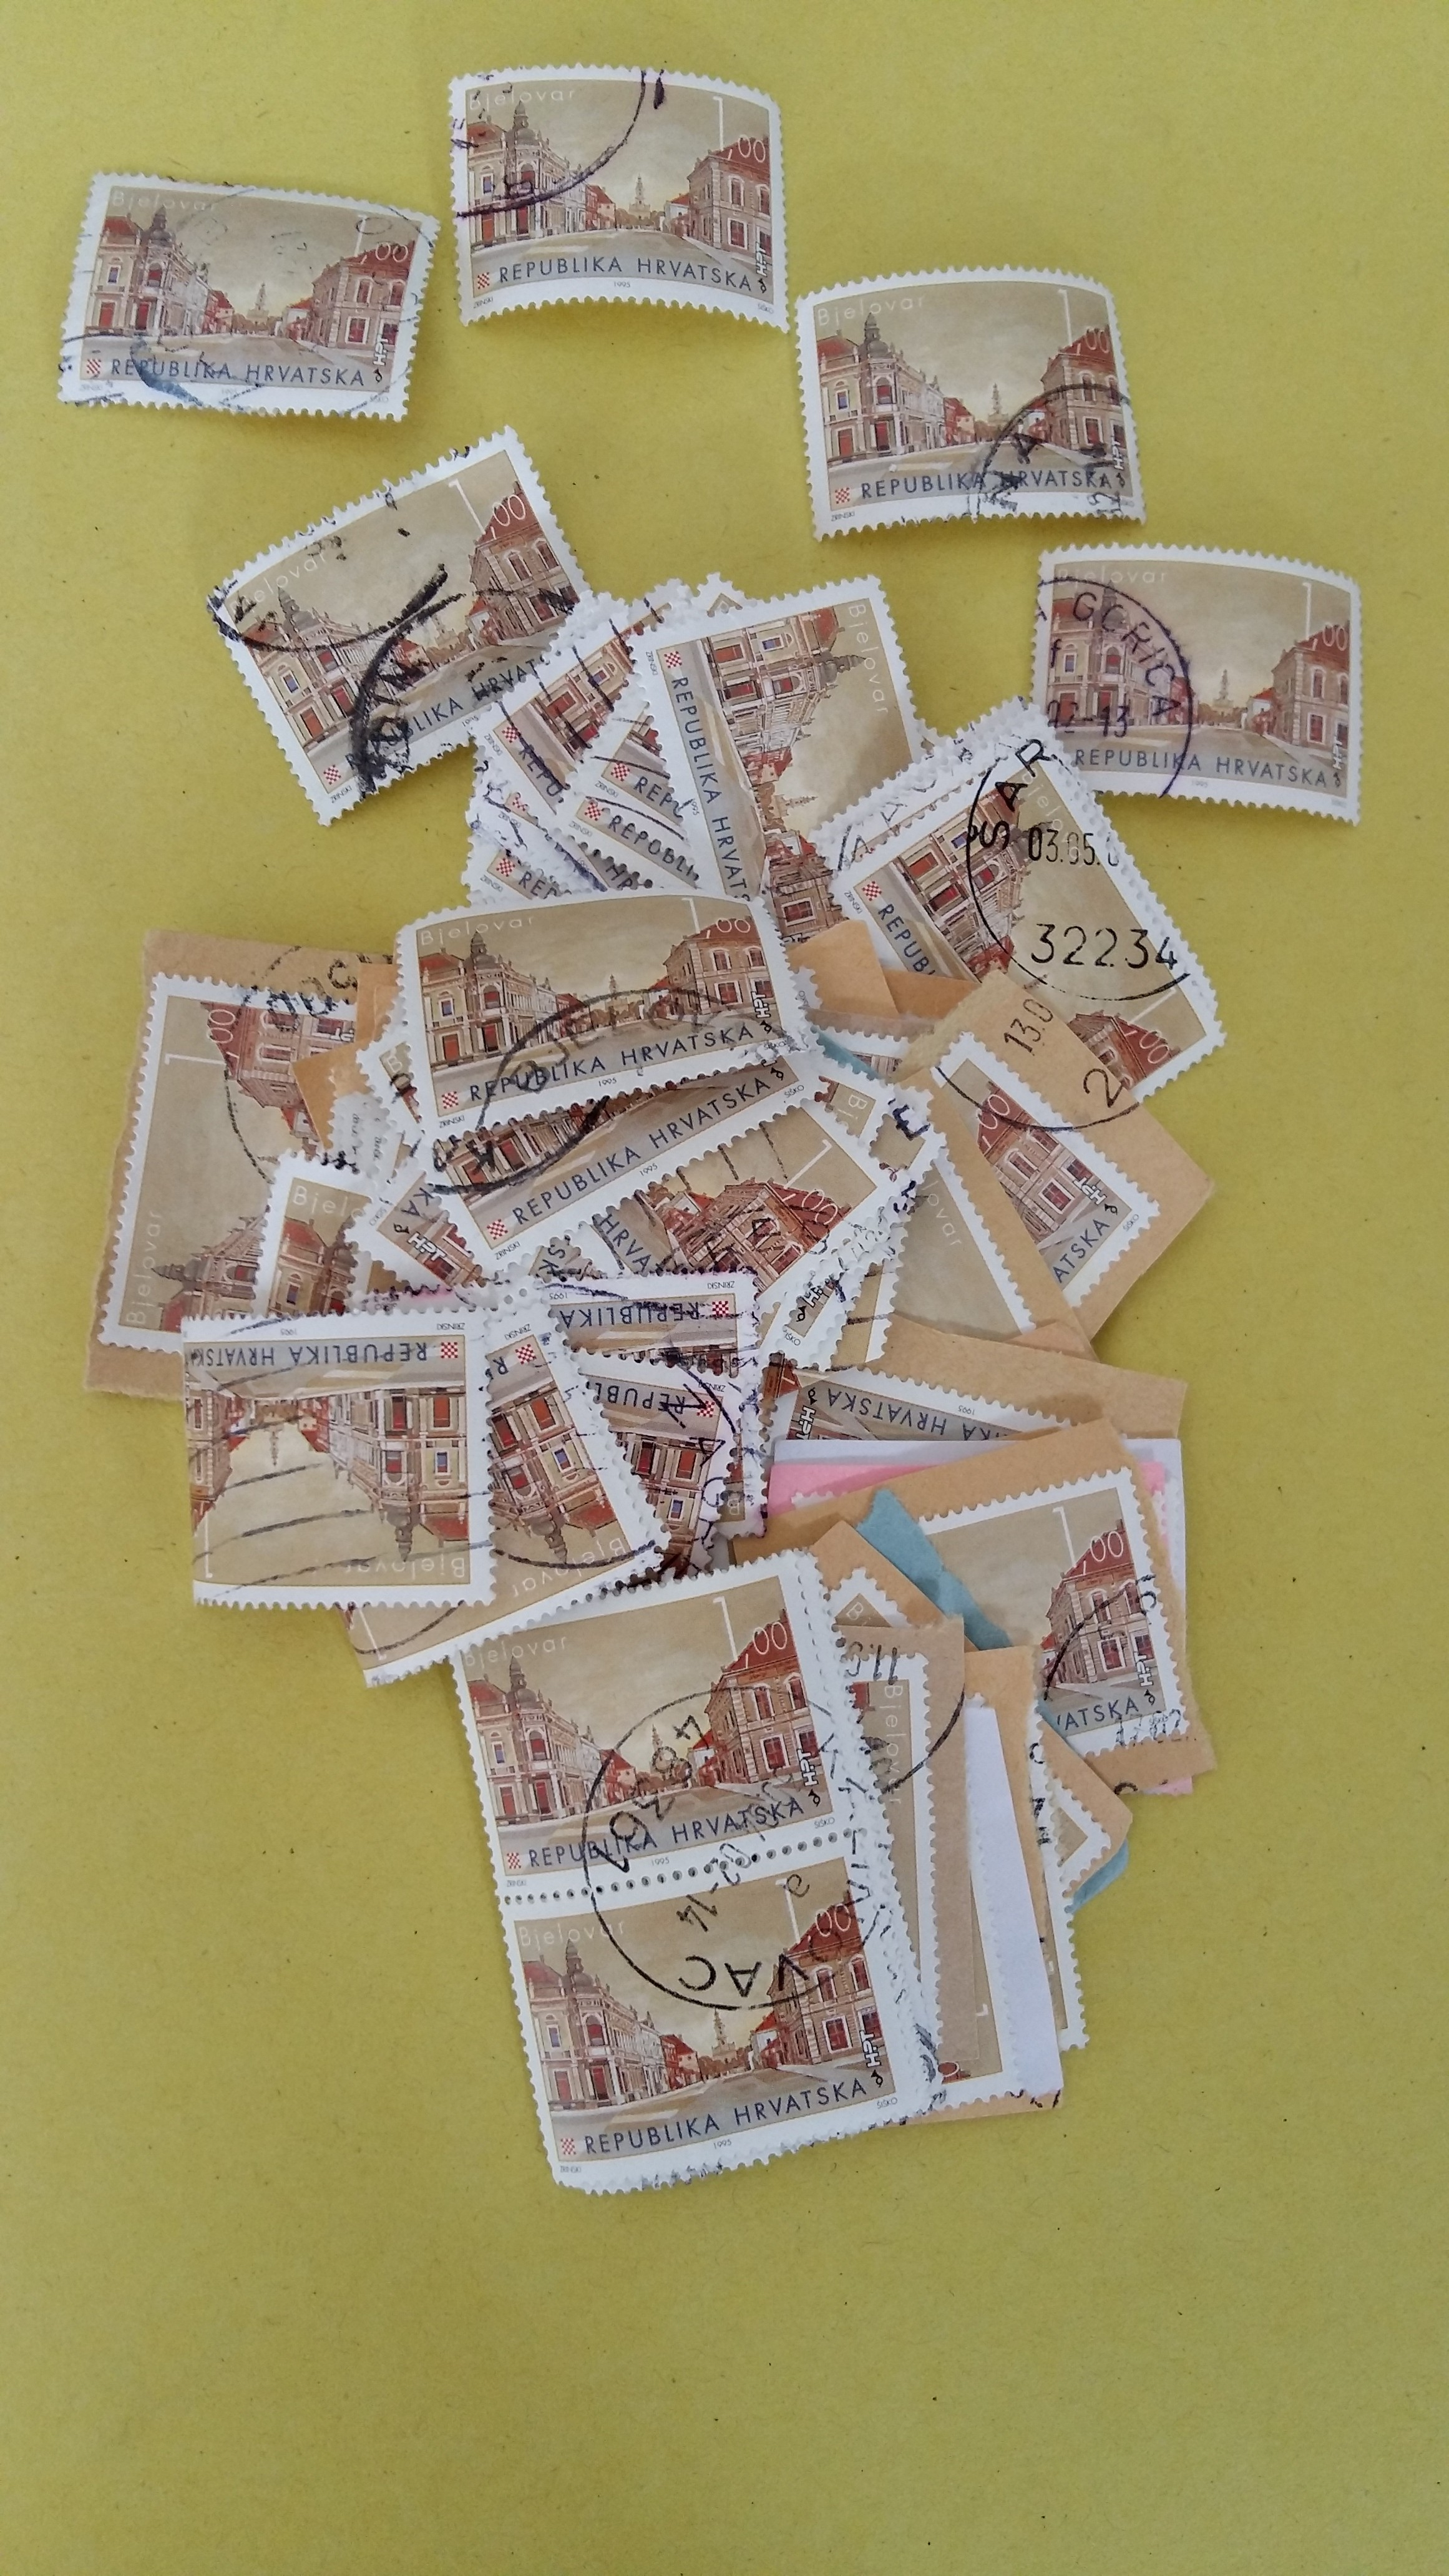 Croatia double stamps 20190928-135259